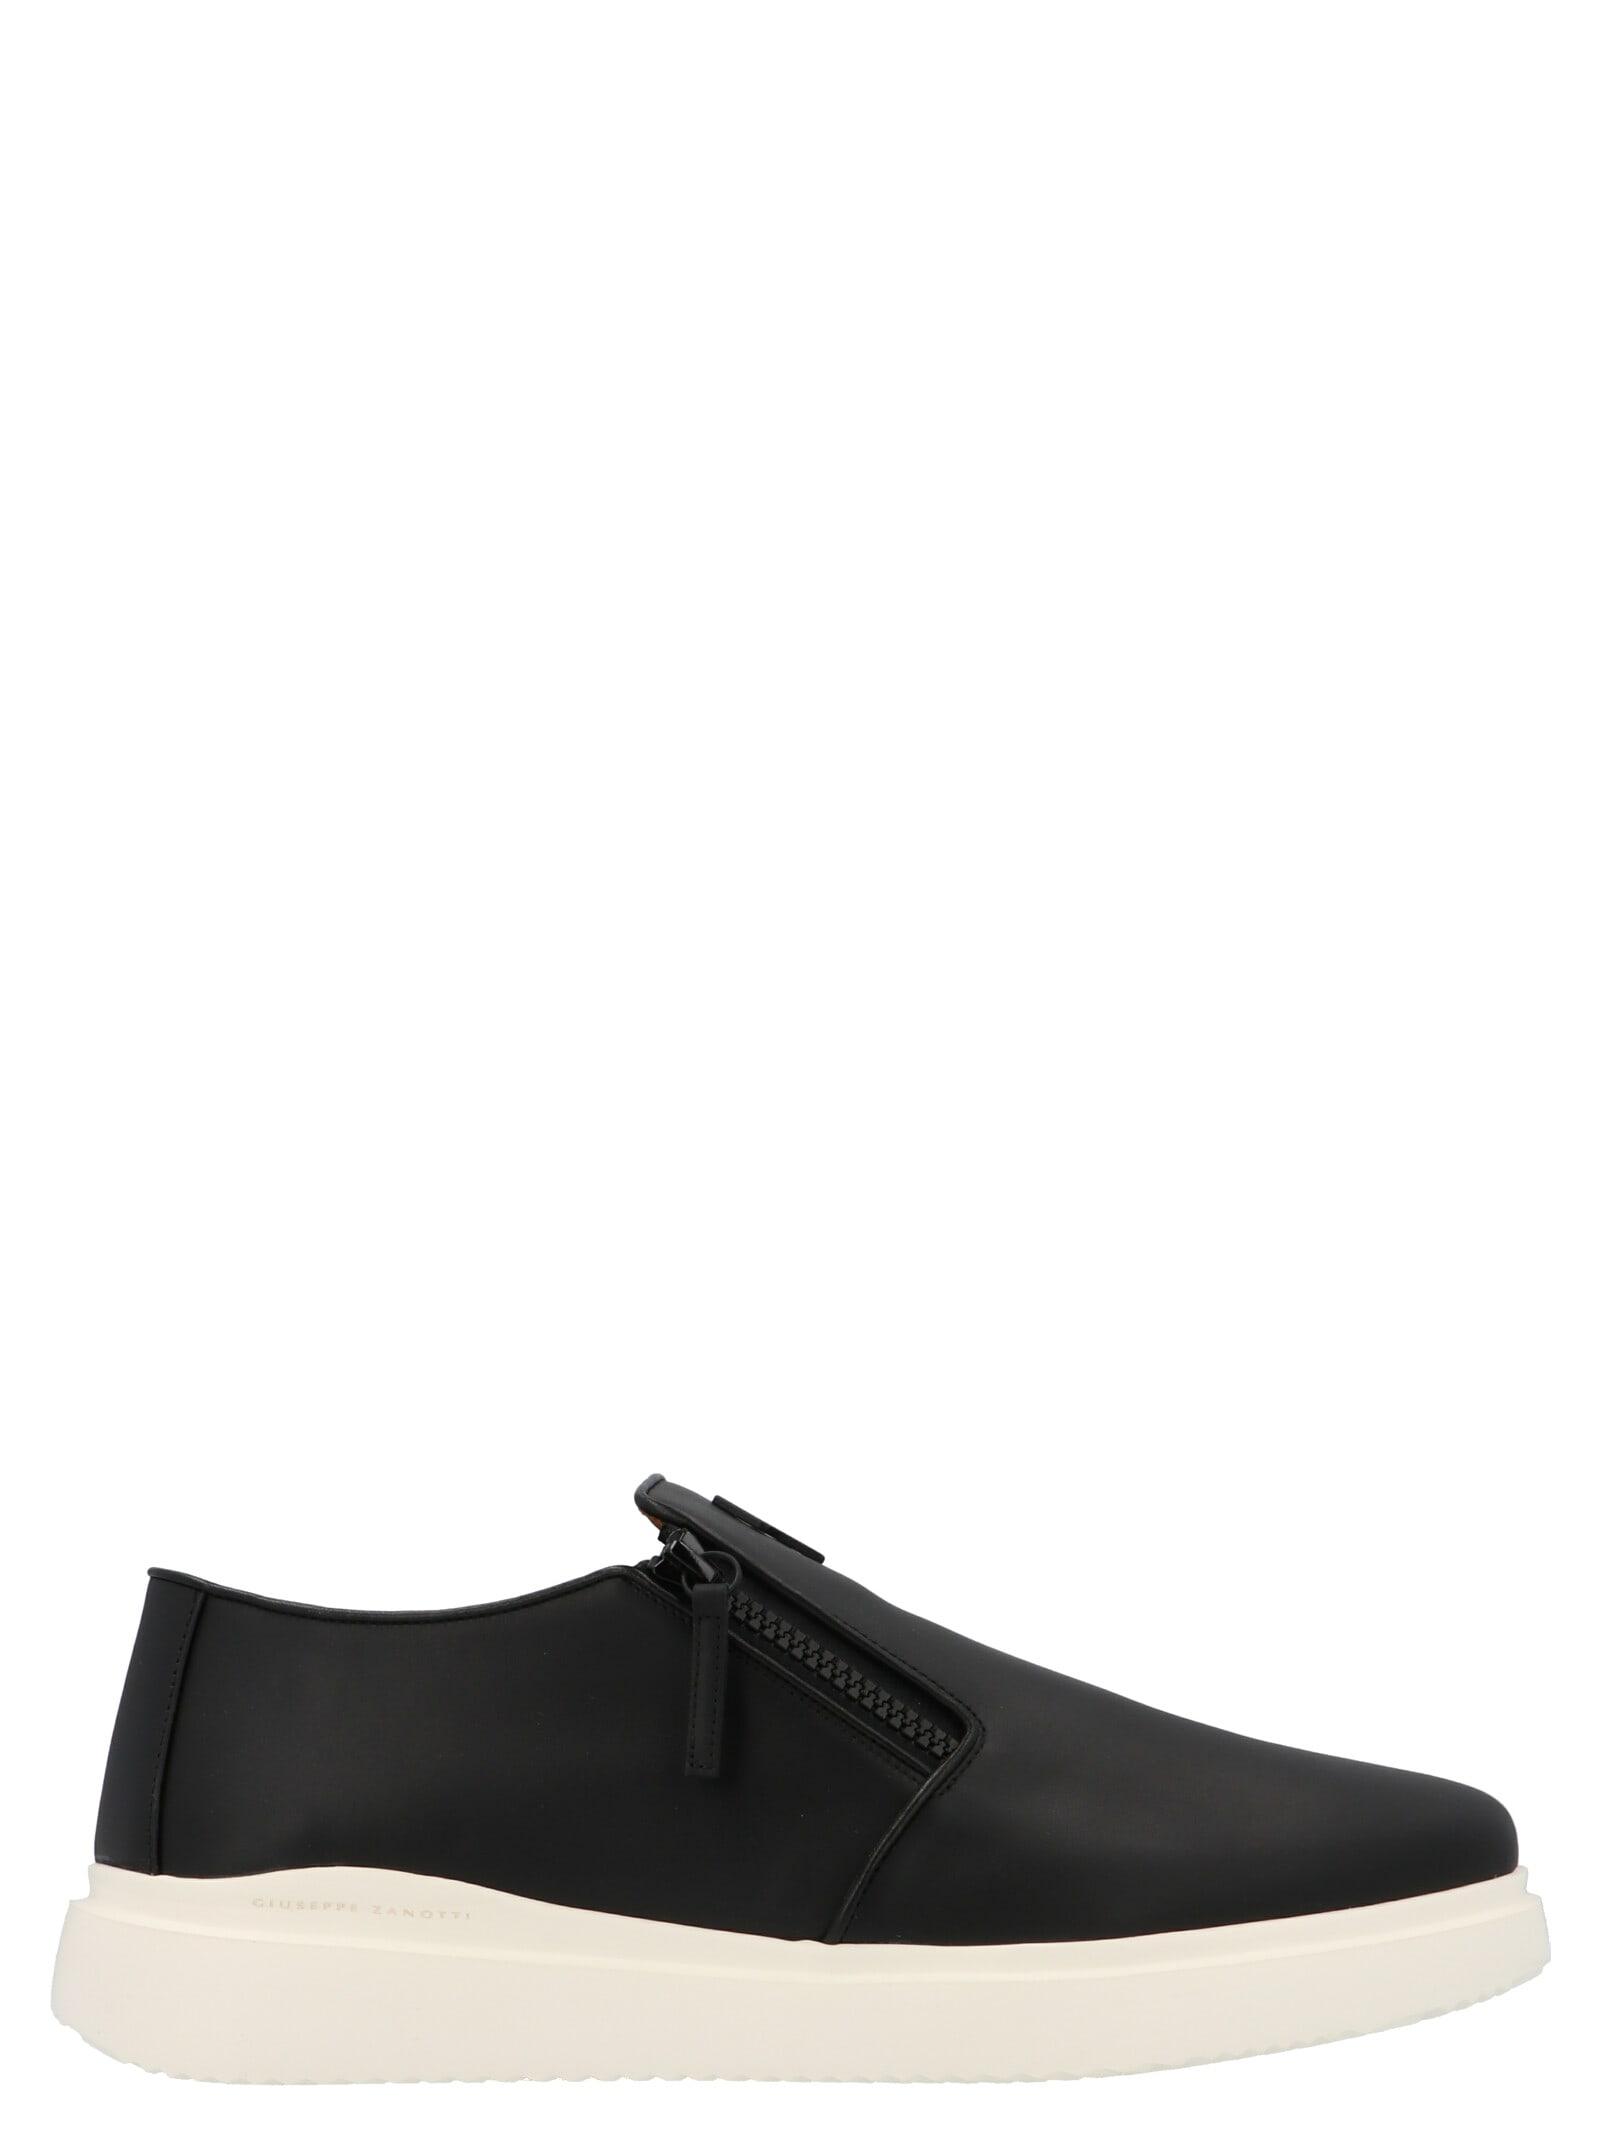 Giuseppe Zanotti dustin Shoes